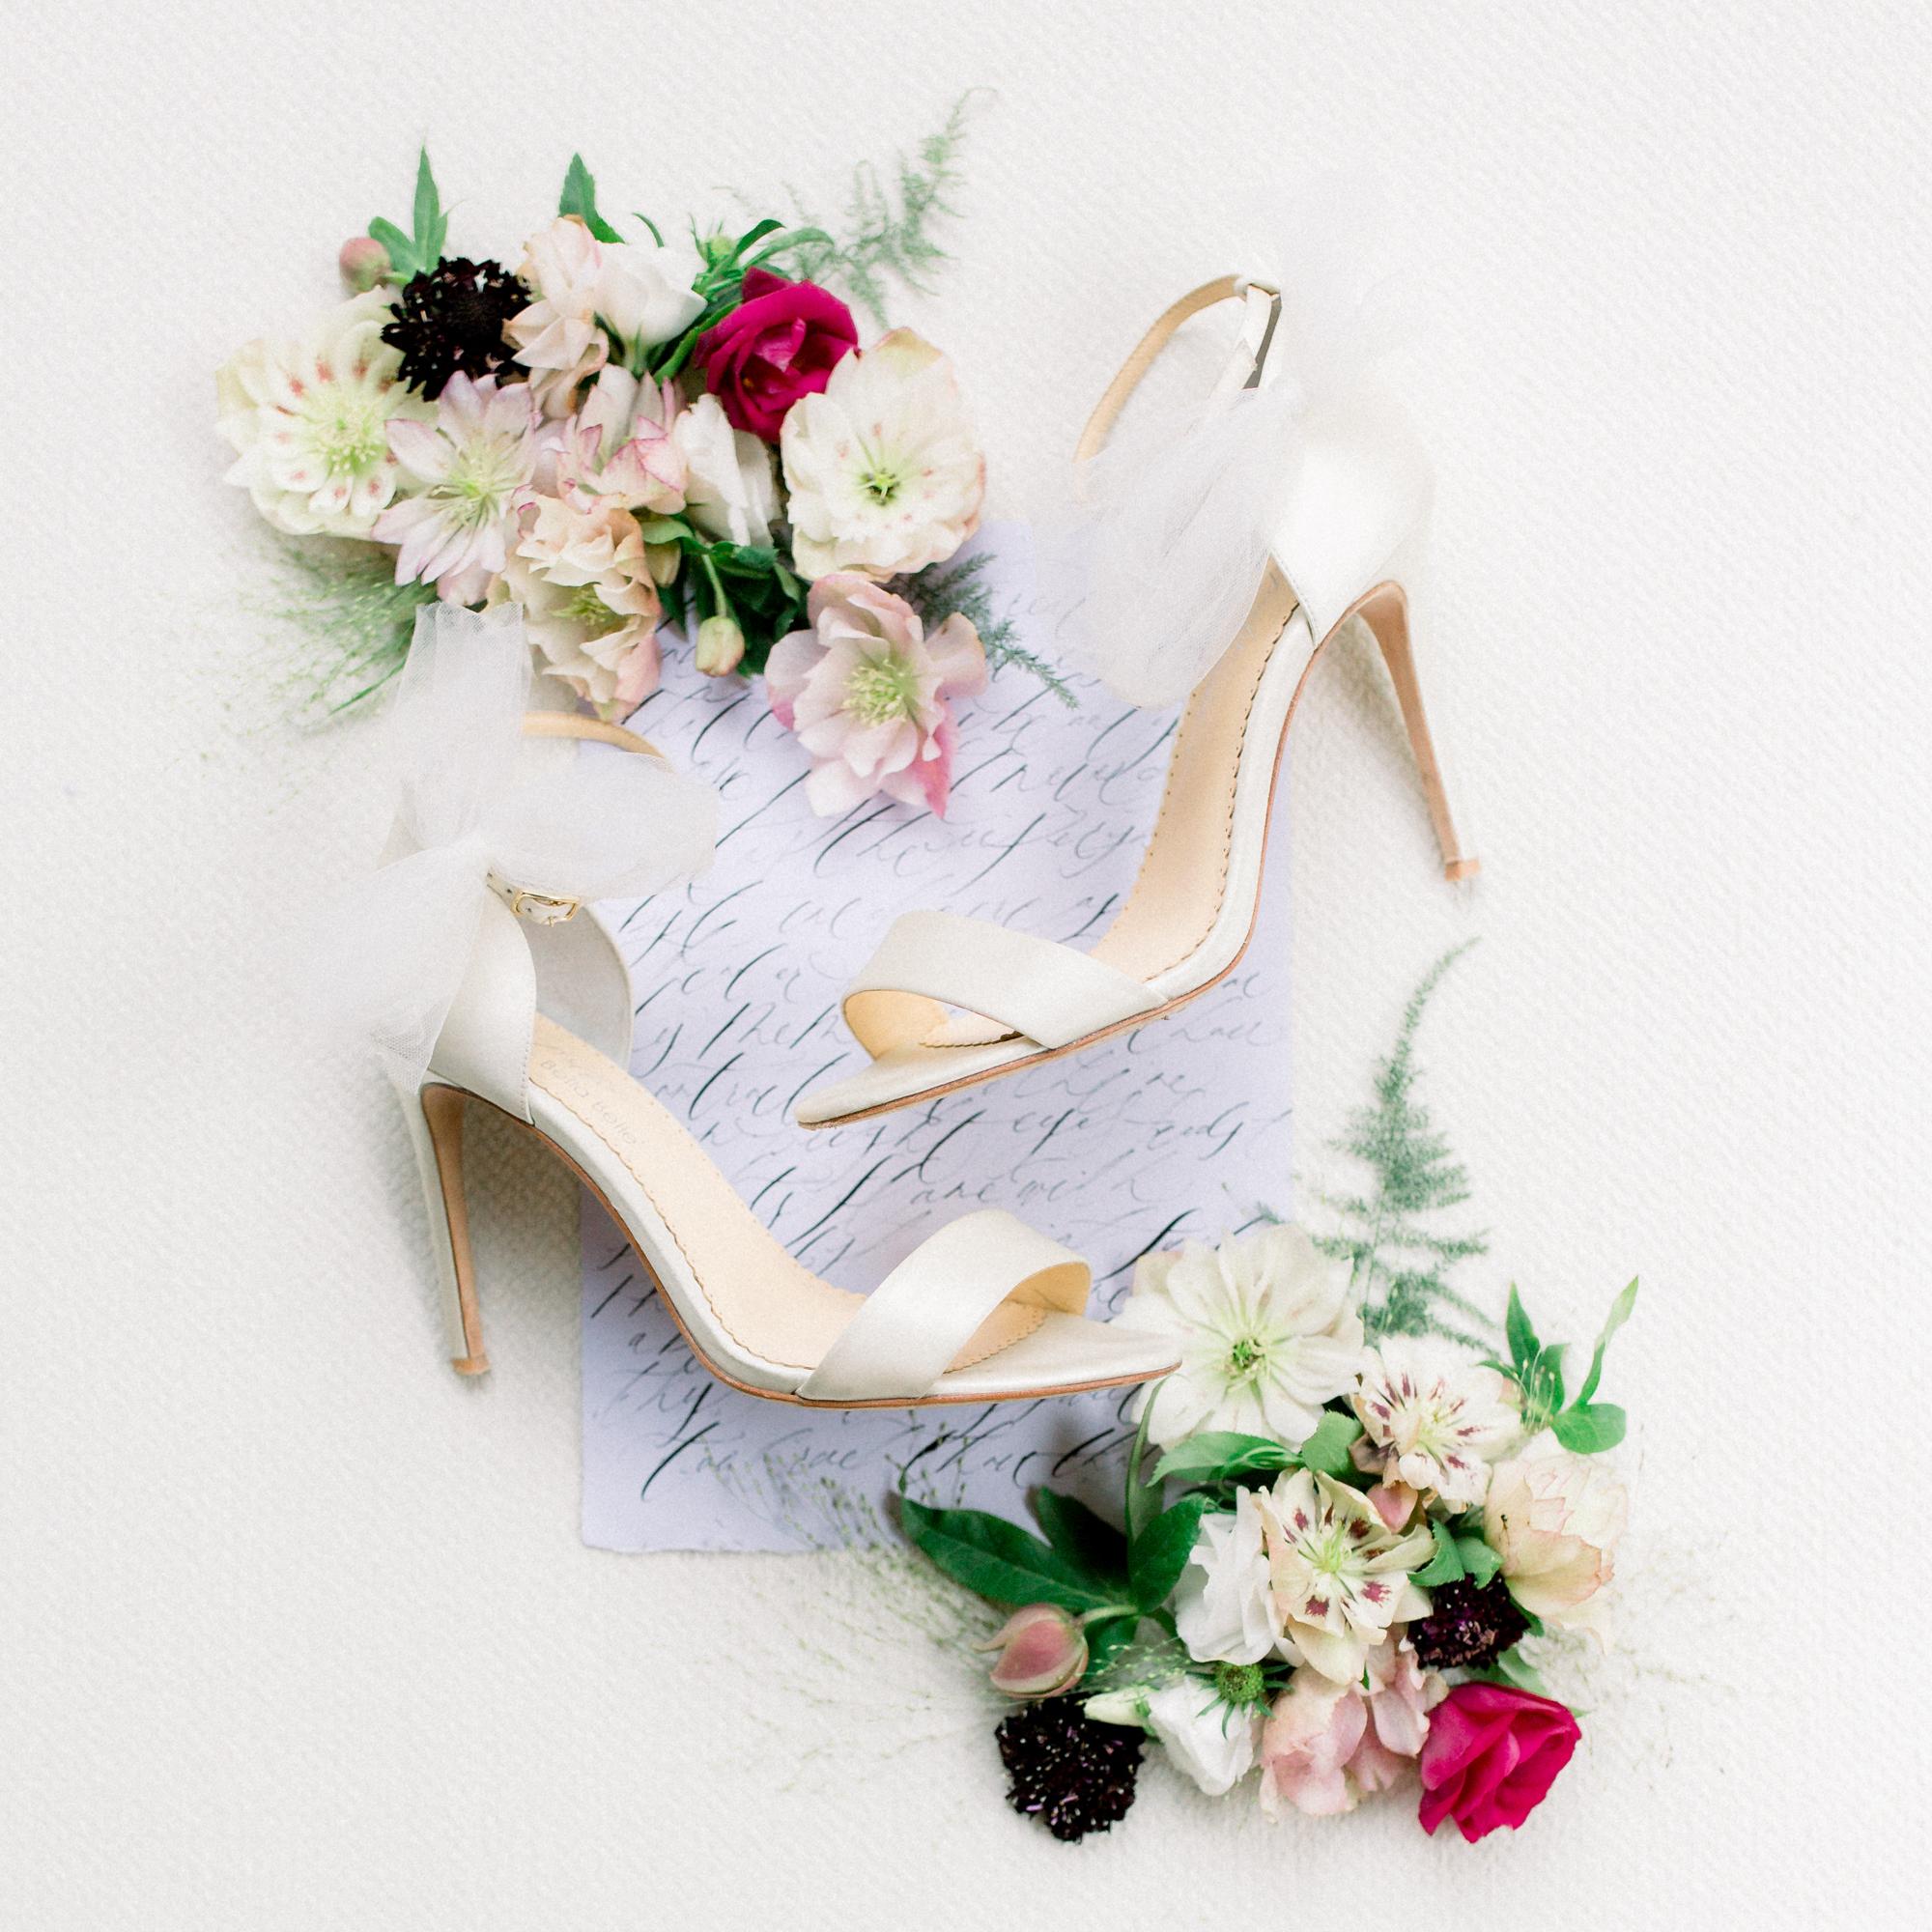 White Sparrow - Lavender Fields - Britt LaShea-9.jpg